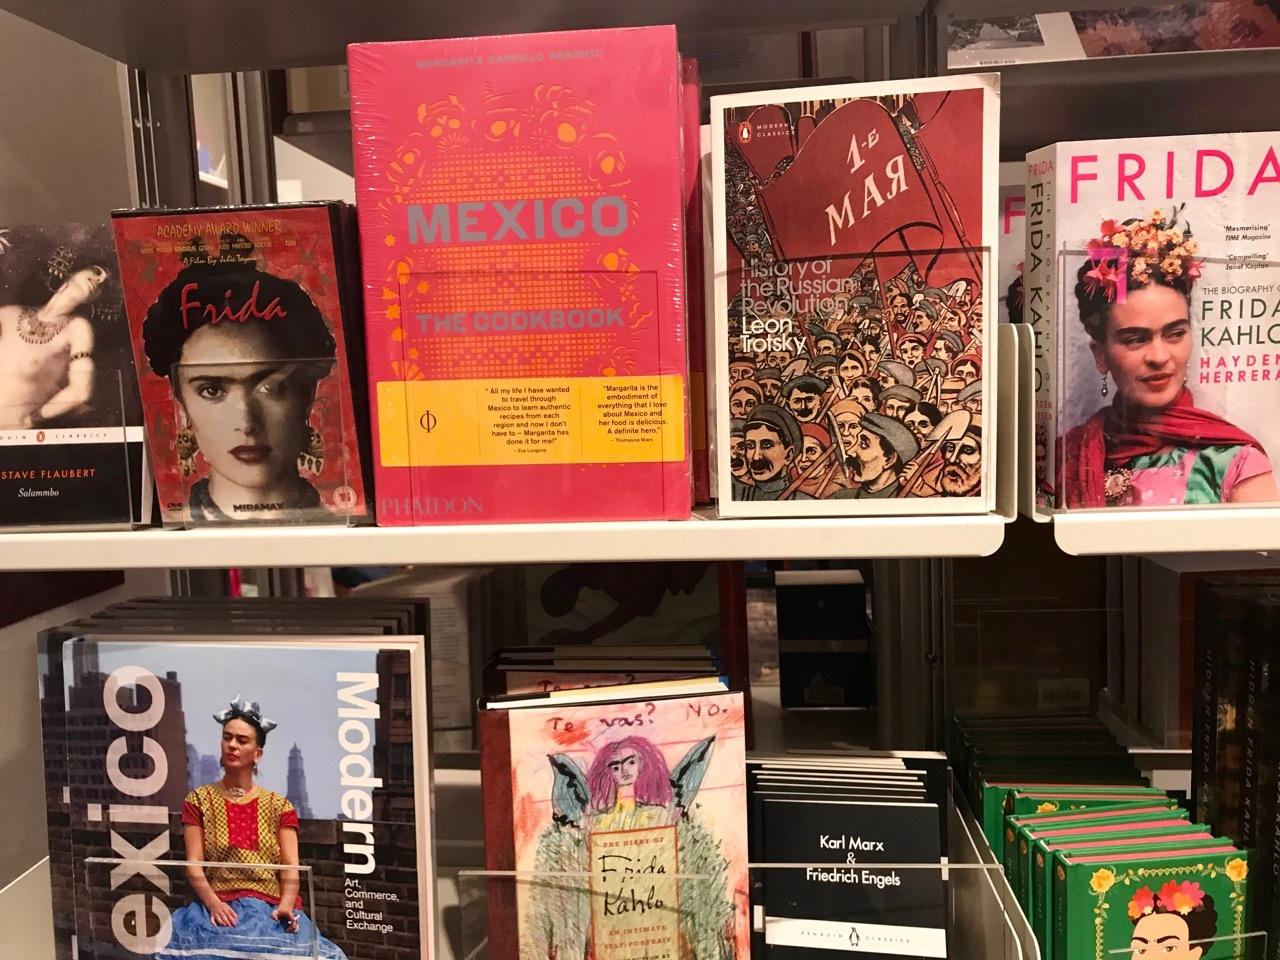 V&A博物館のフリーダ・カーロ展、Frida Kahlo - Making Her Self Up_e0114020_07034396.jpg